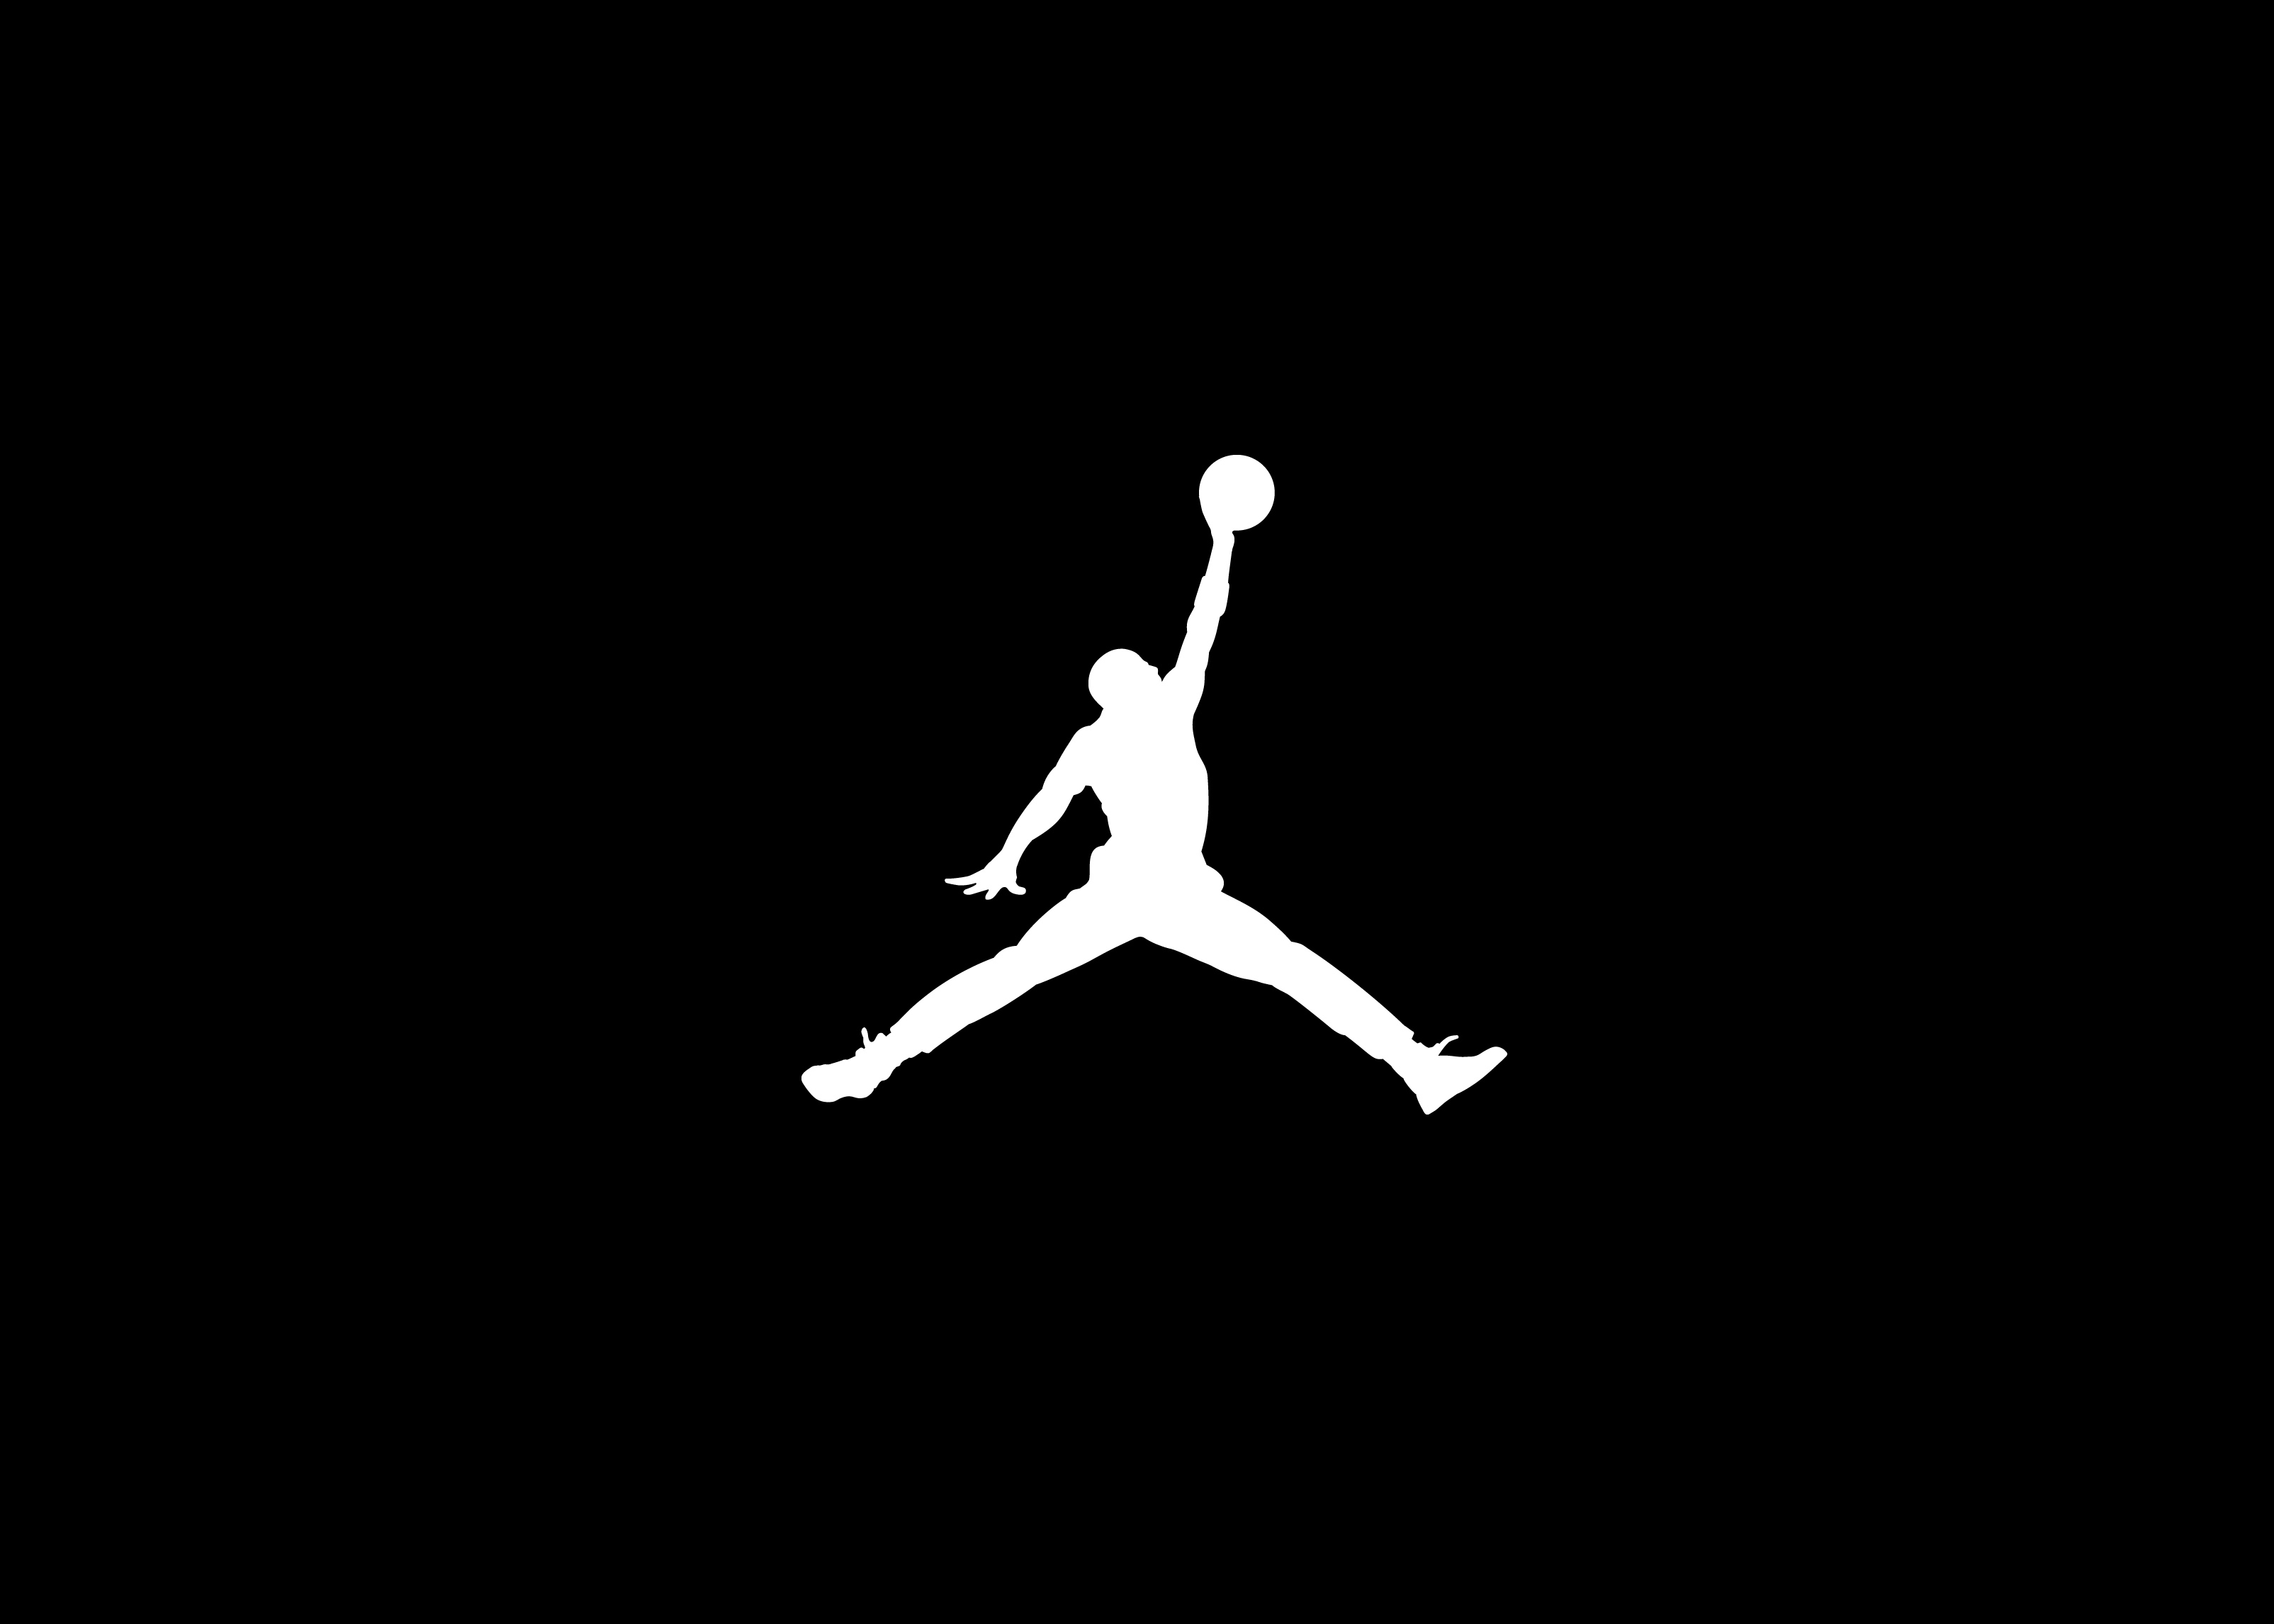 10 Best Air Jordan Wallpaper Hd FULL HD 1080p For PC Background